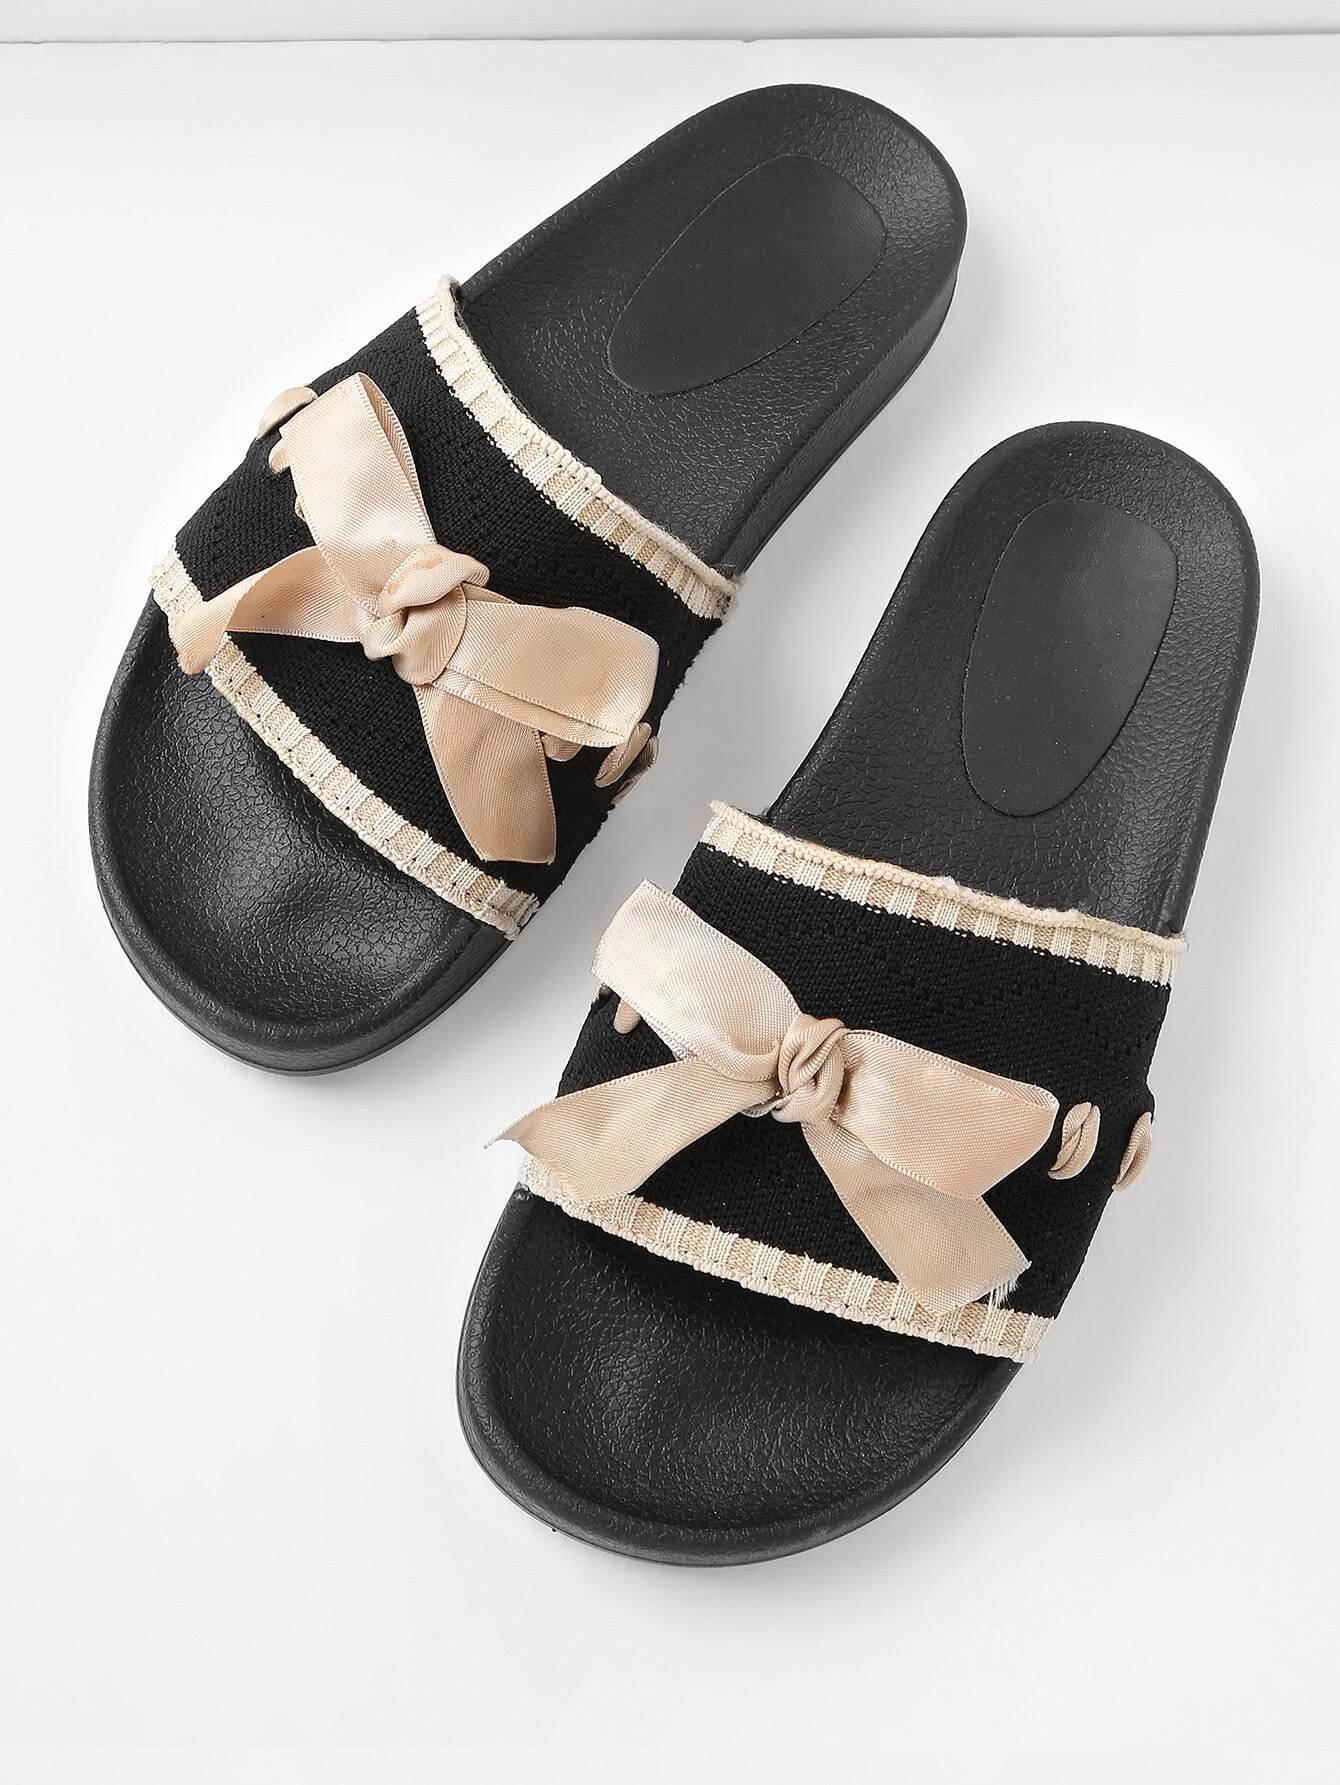 Фото Bow Tie Detail Knit Slip On Sandals. Купить с доставкой